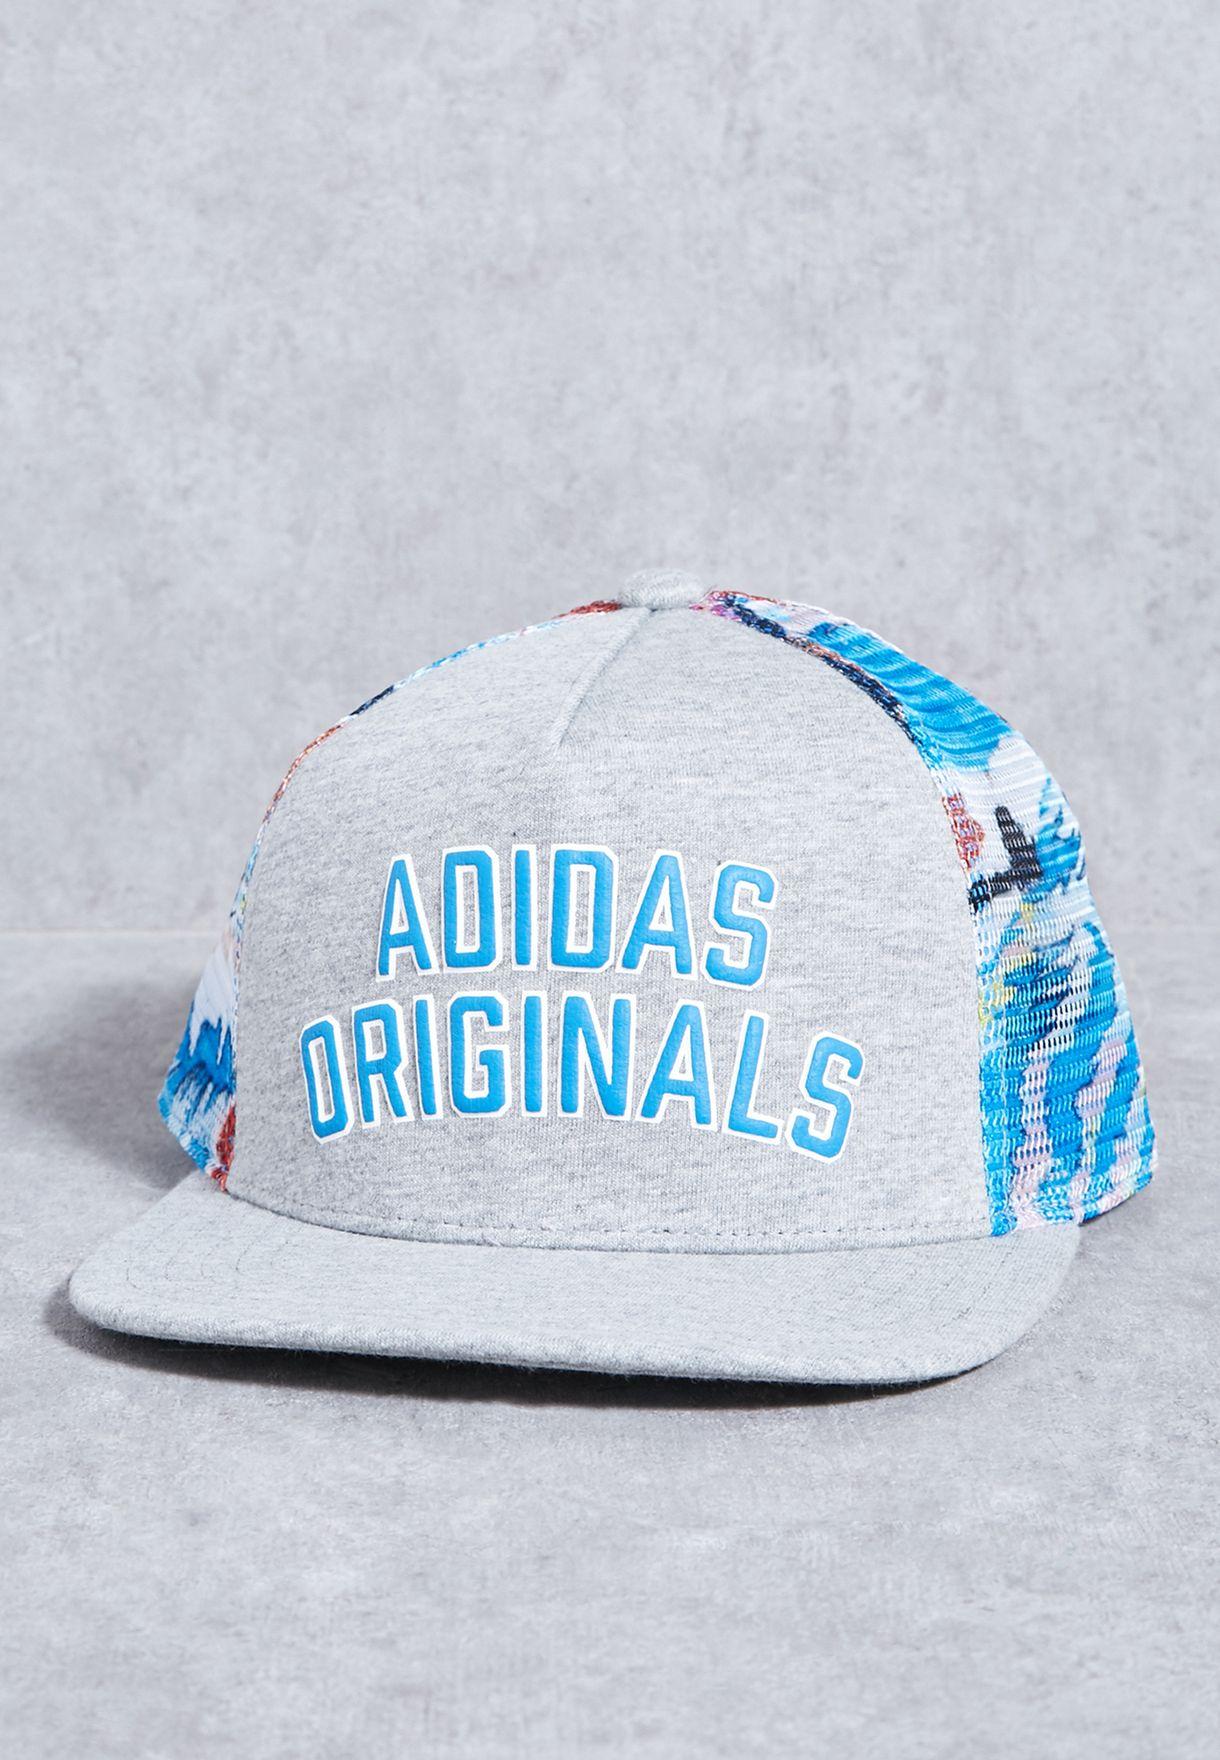 03c560955ef Shop adidas Originals grey Logo Cap BK2190 for Men in UAE - AD478AC17SBY